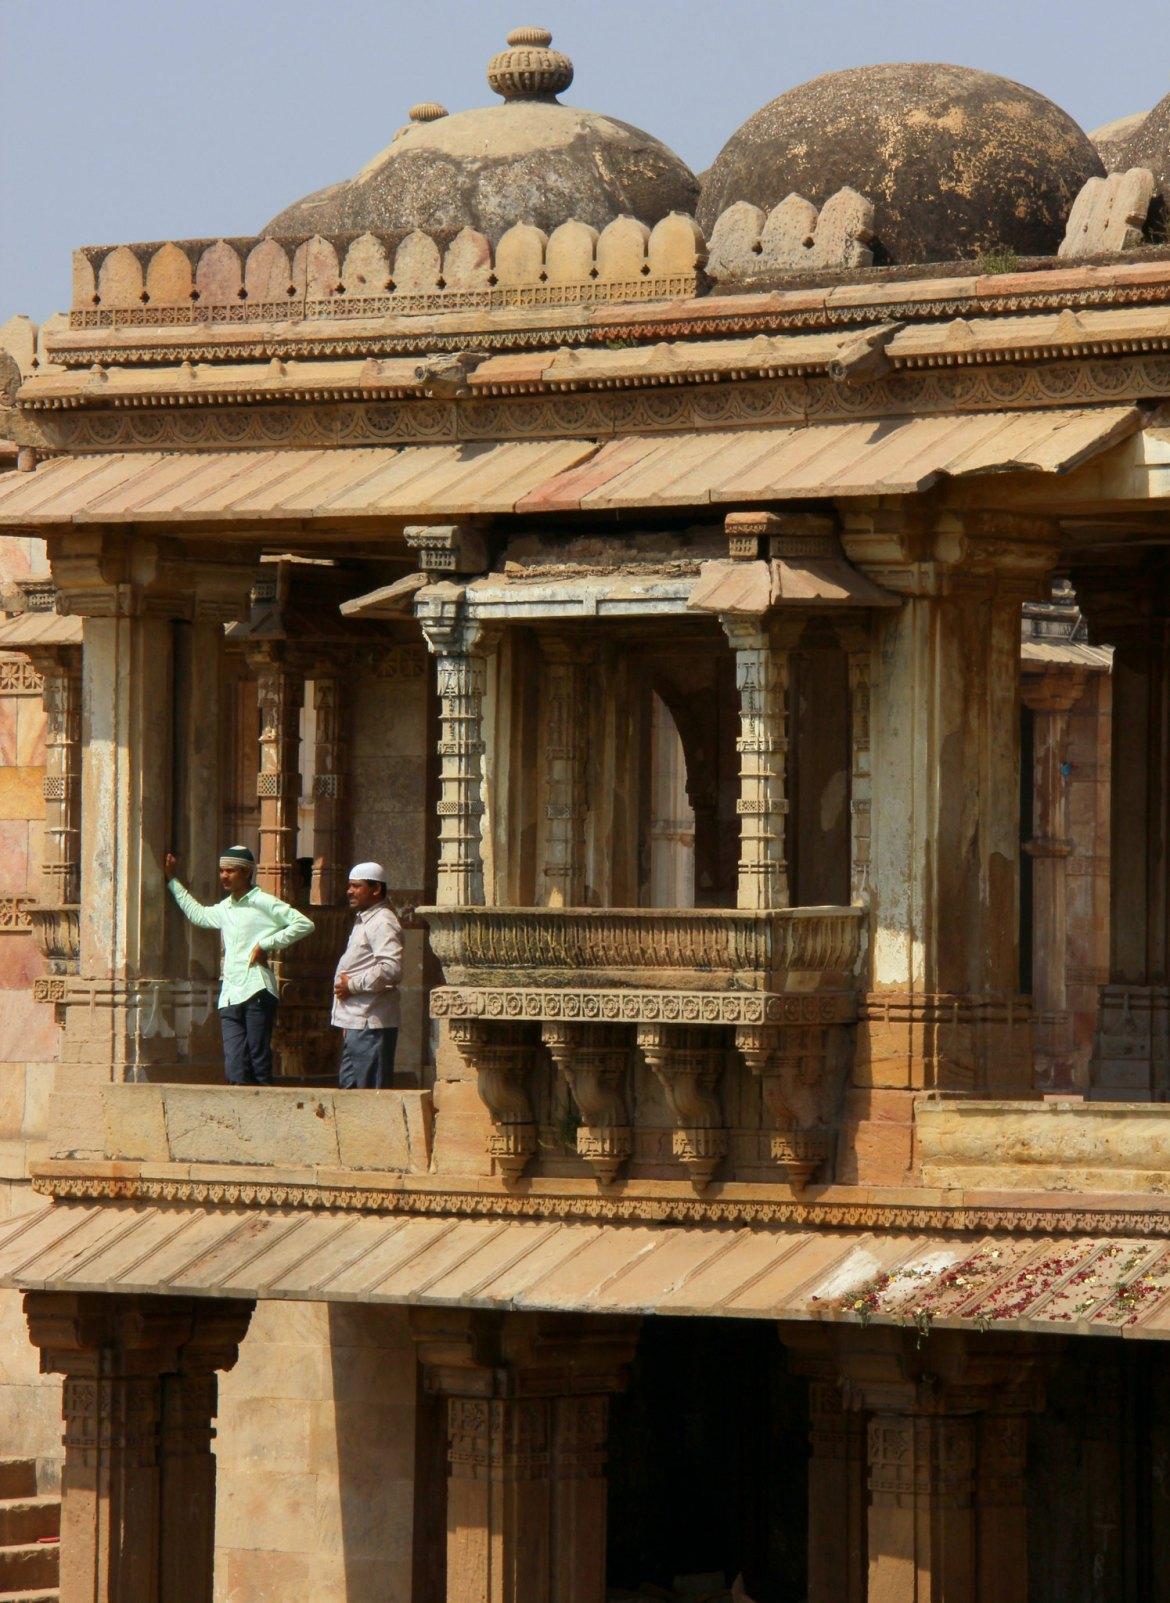 #gujarattourism #ahmedabad #travelbloggerindia #travelblogindia #sarkhejroza